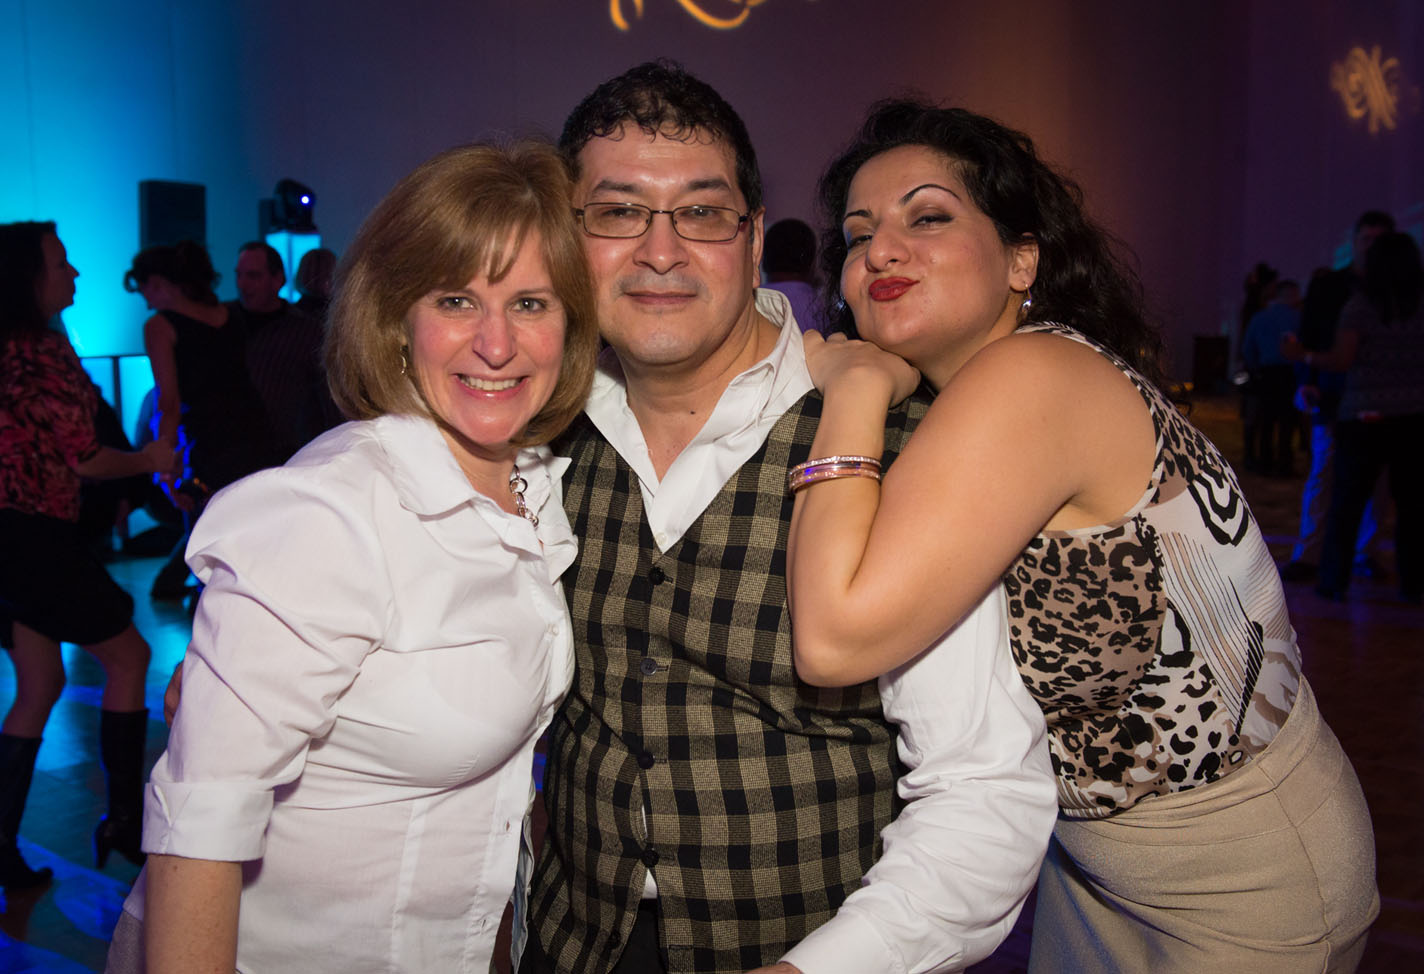 2015-12-09 ReMax Corpoarte Event - The Borgata - Atlantic City NJ - Photo Sesh - 2015-5254.jpg